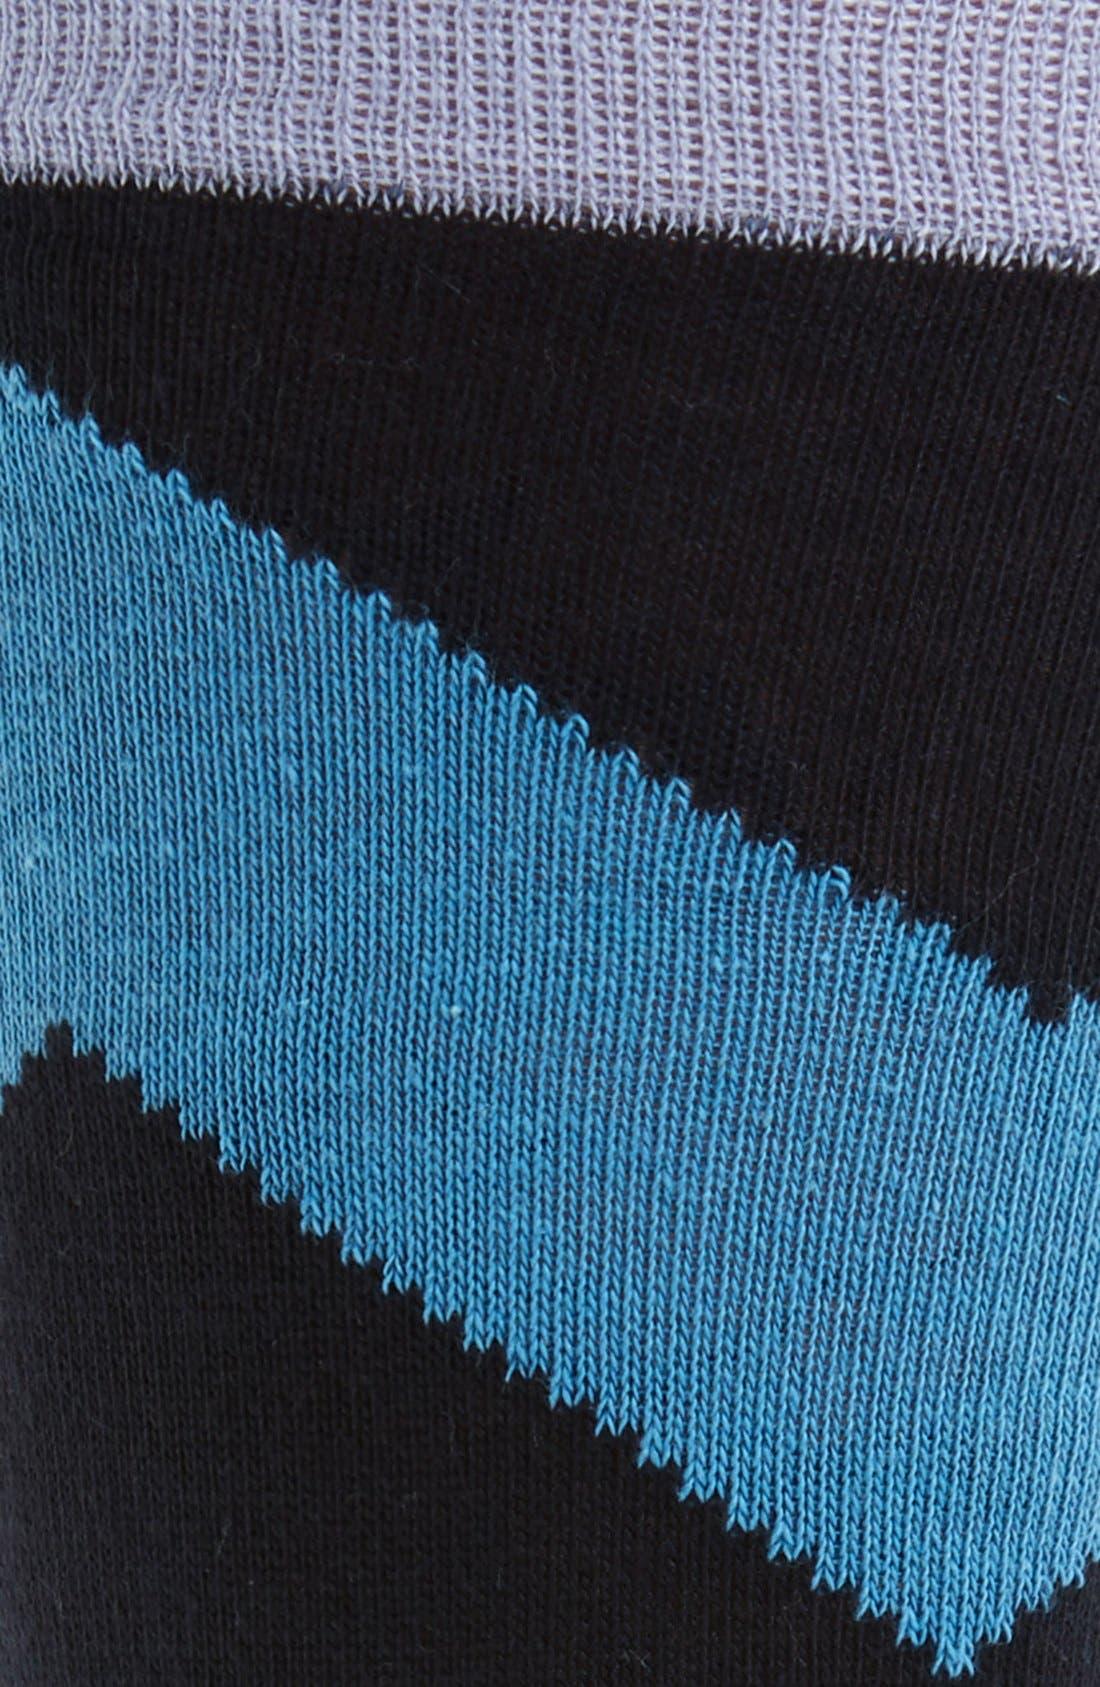 Chevron Stripe Socks,                             Alternate thumbnail 2, color,                             Blue/ Lavender